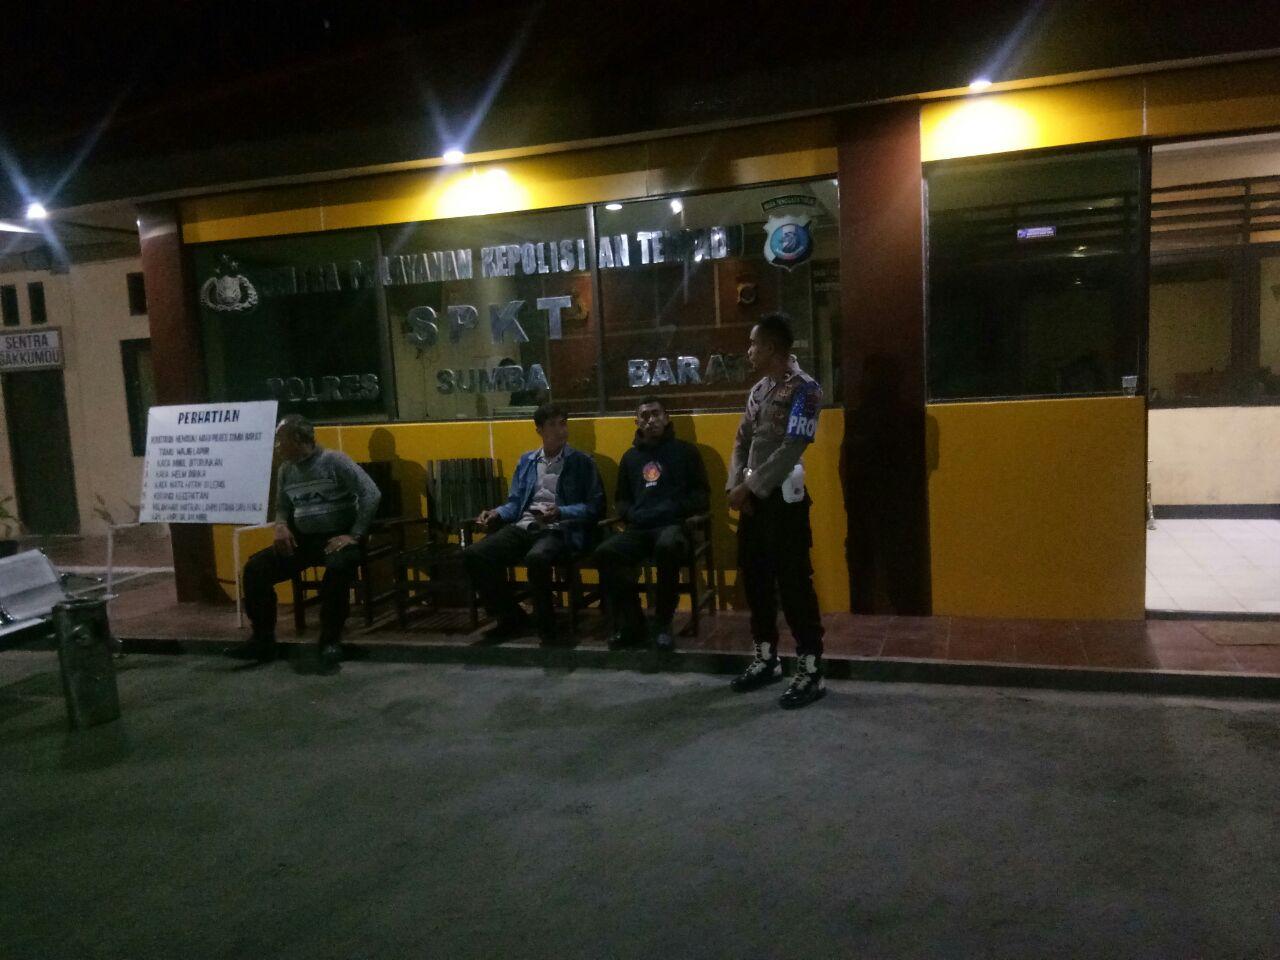 Polres Sumba Barat Laksanakan Patroli Rutin, Demi Situasi Kamtibmas Yang Kondusif